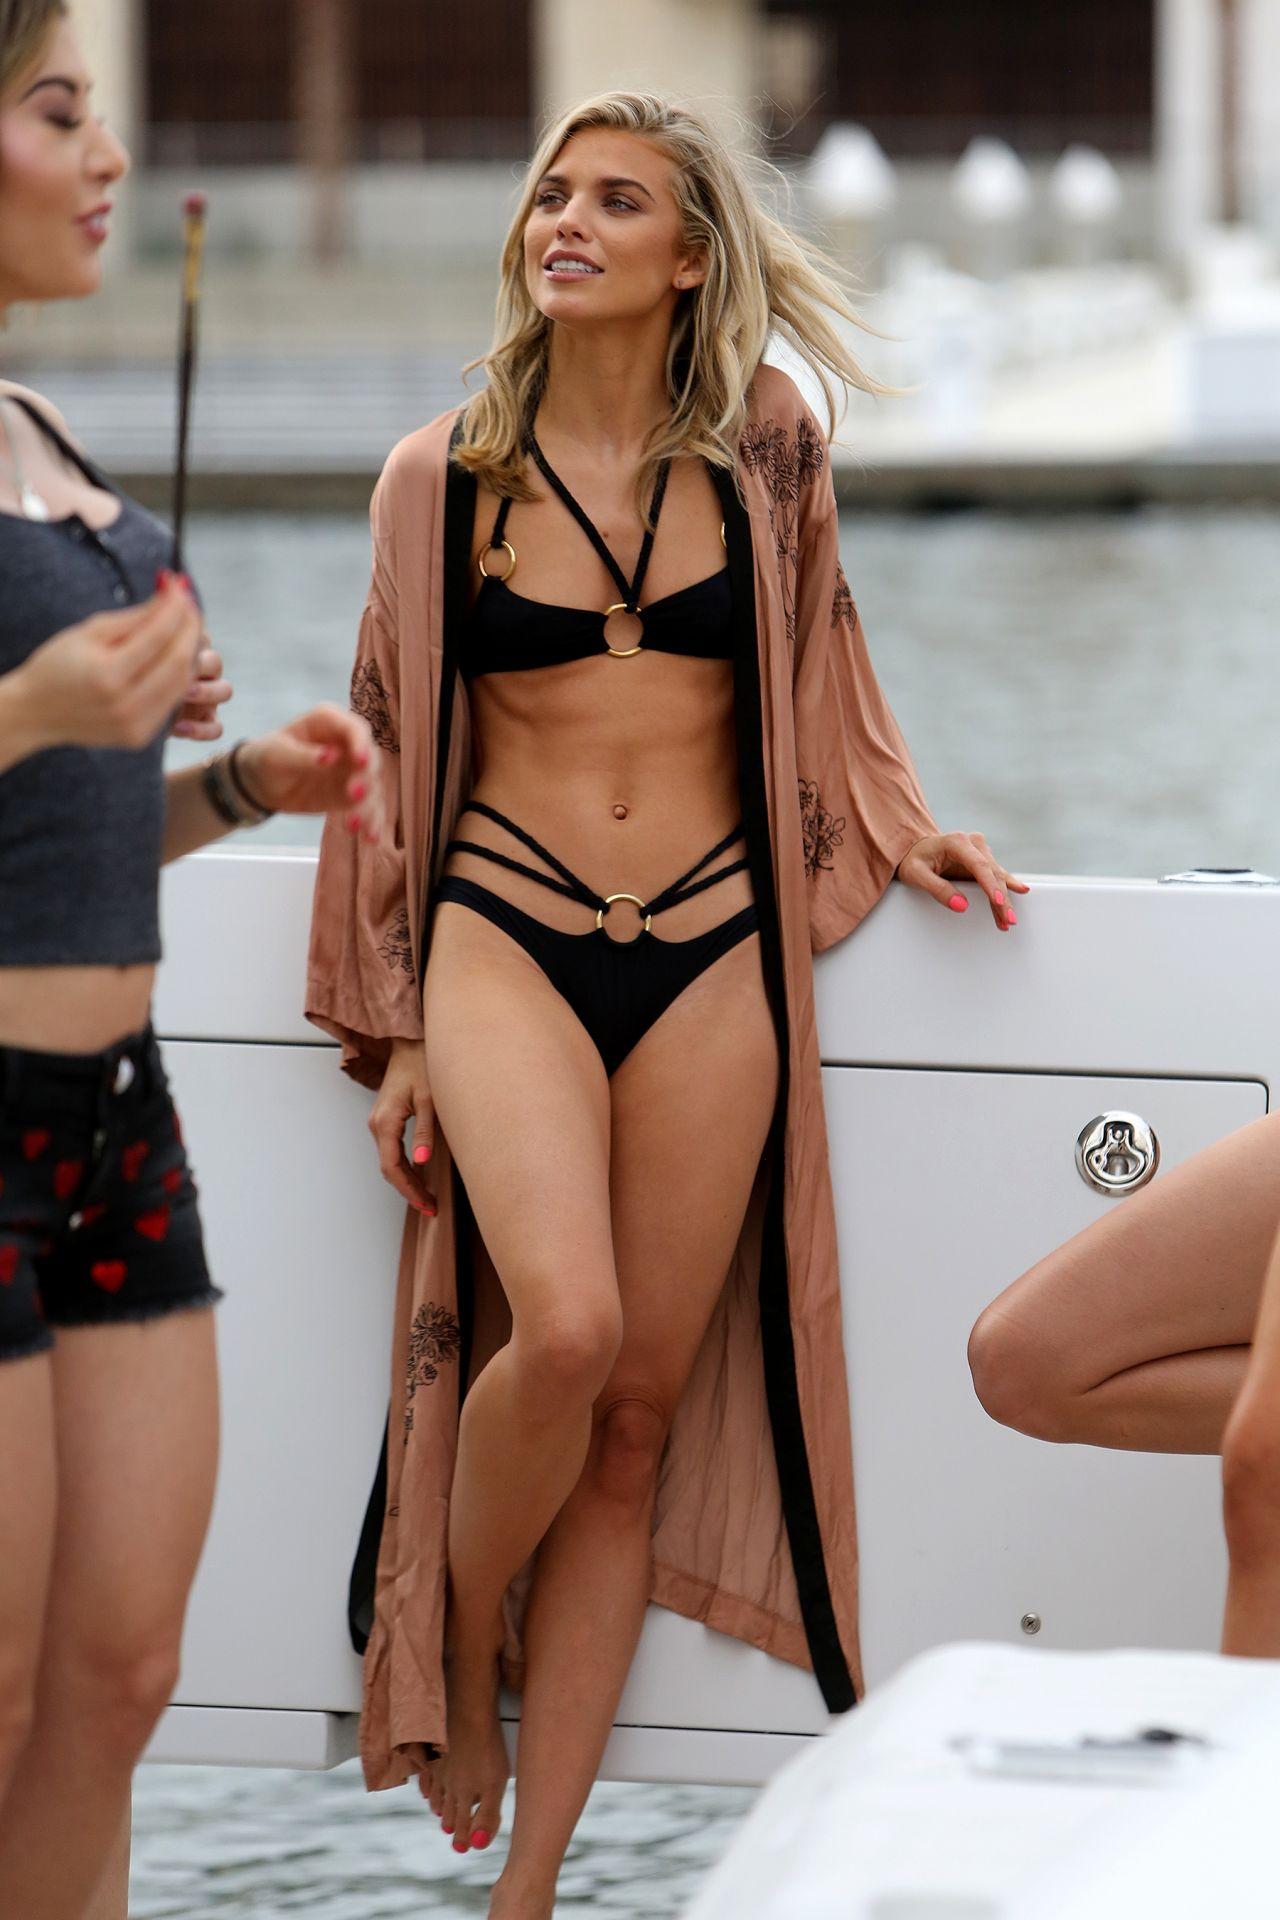 Annalyne mccord bikini